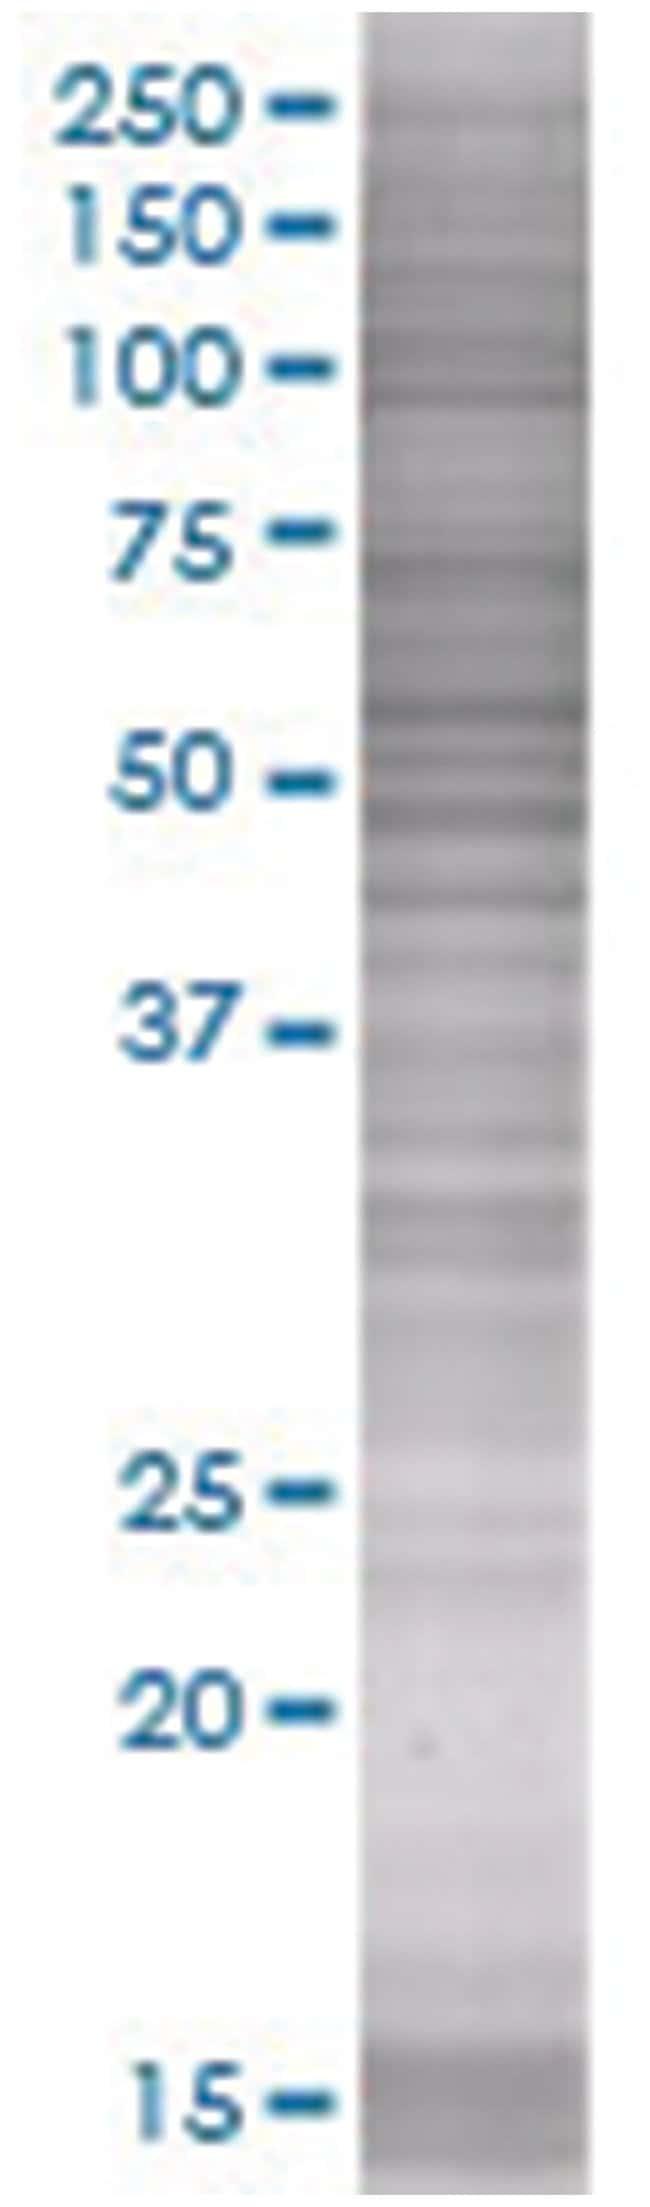 KRT8 293T Cell Overexpression Lysate 1 (Denatured), Abnova 100µL:Life